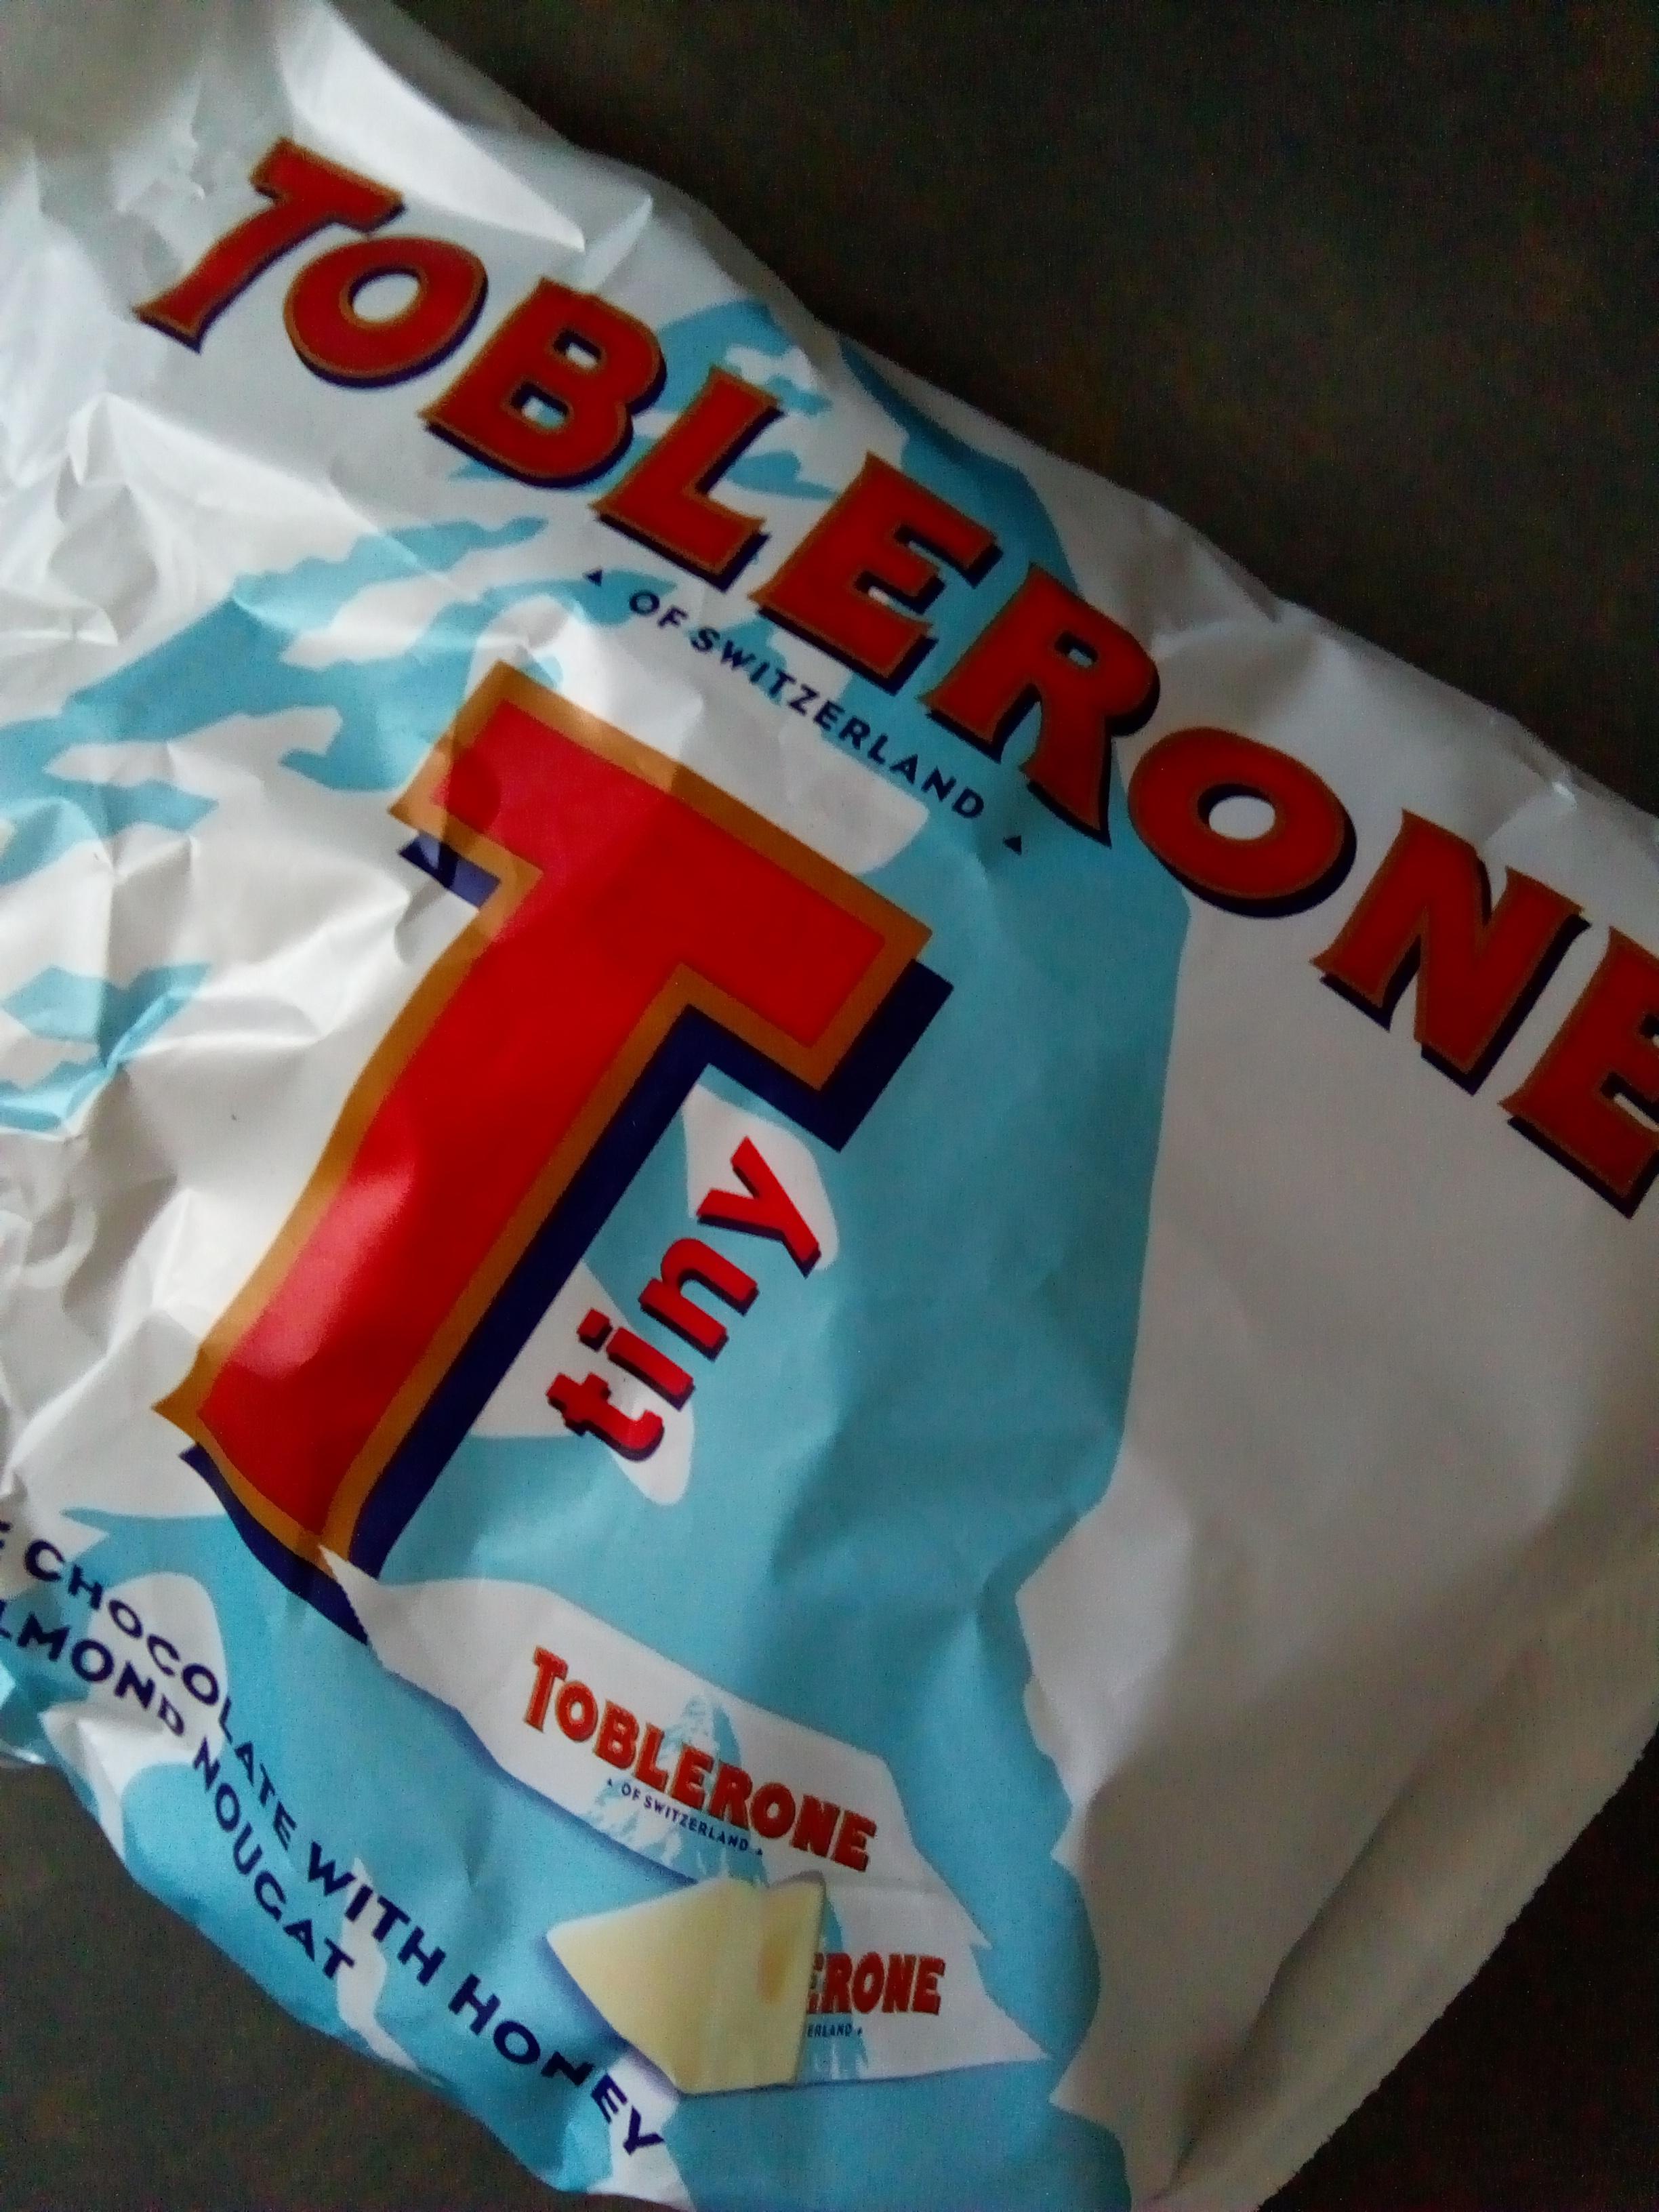 Toblerone Tiny 200g of white or milk chocolate £2 in poundland